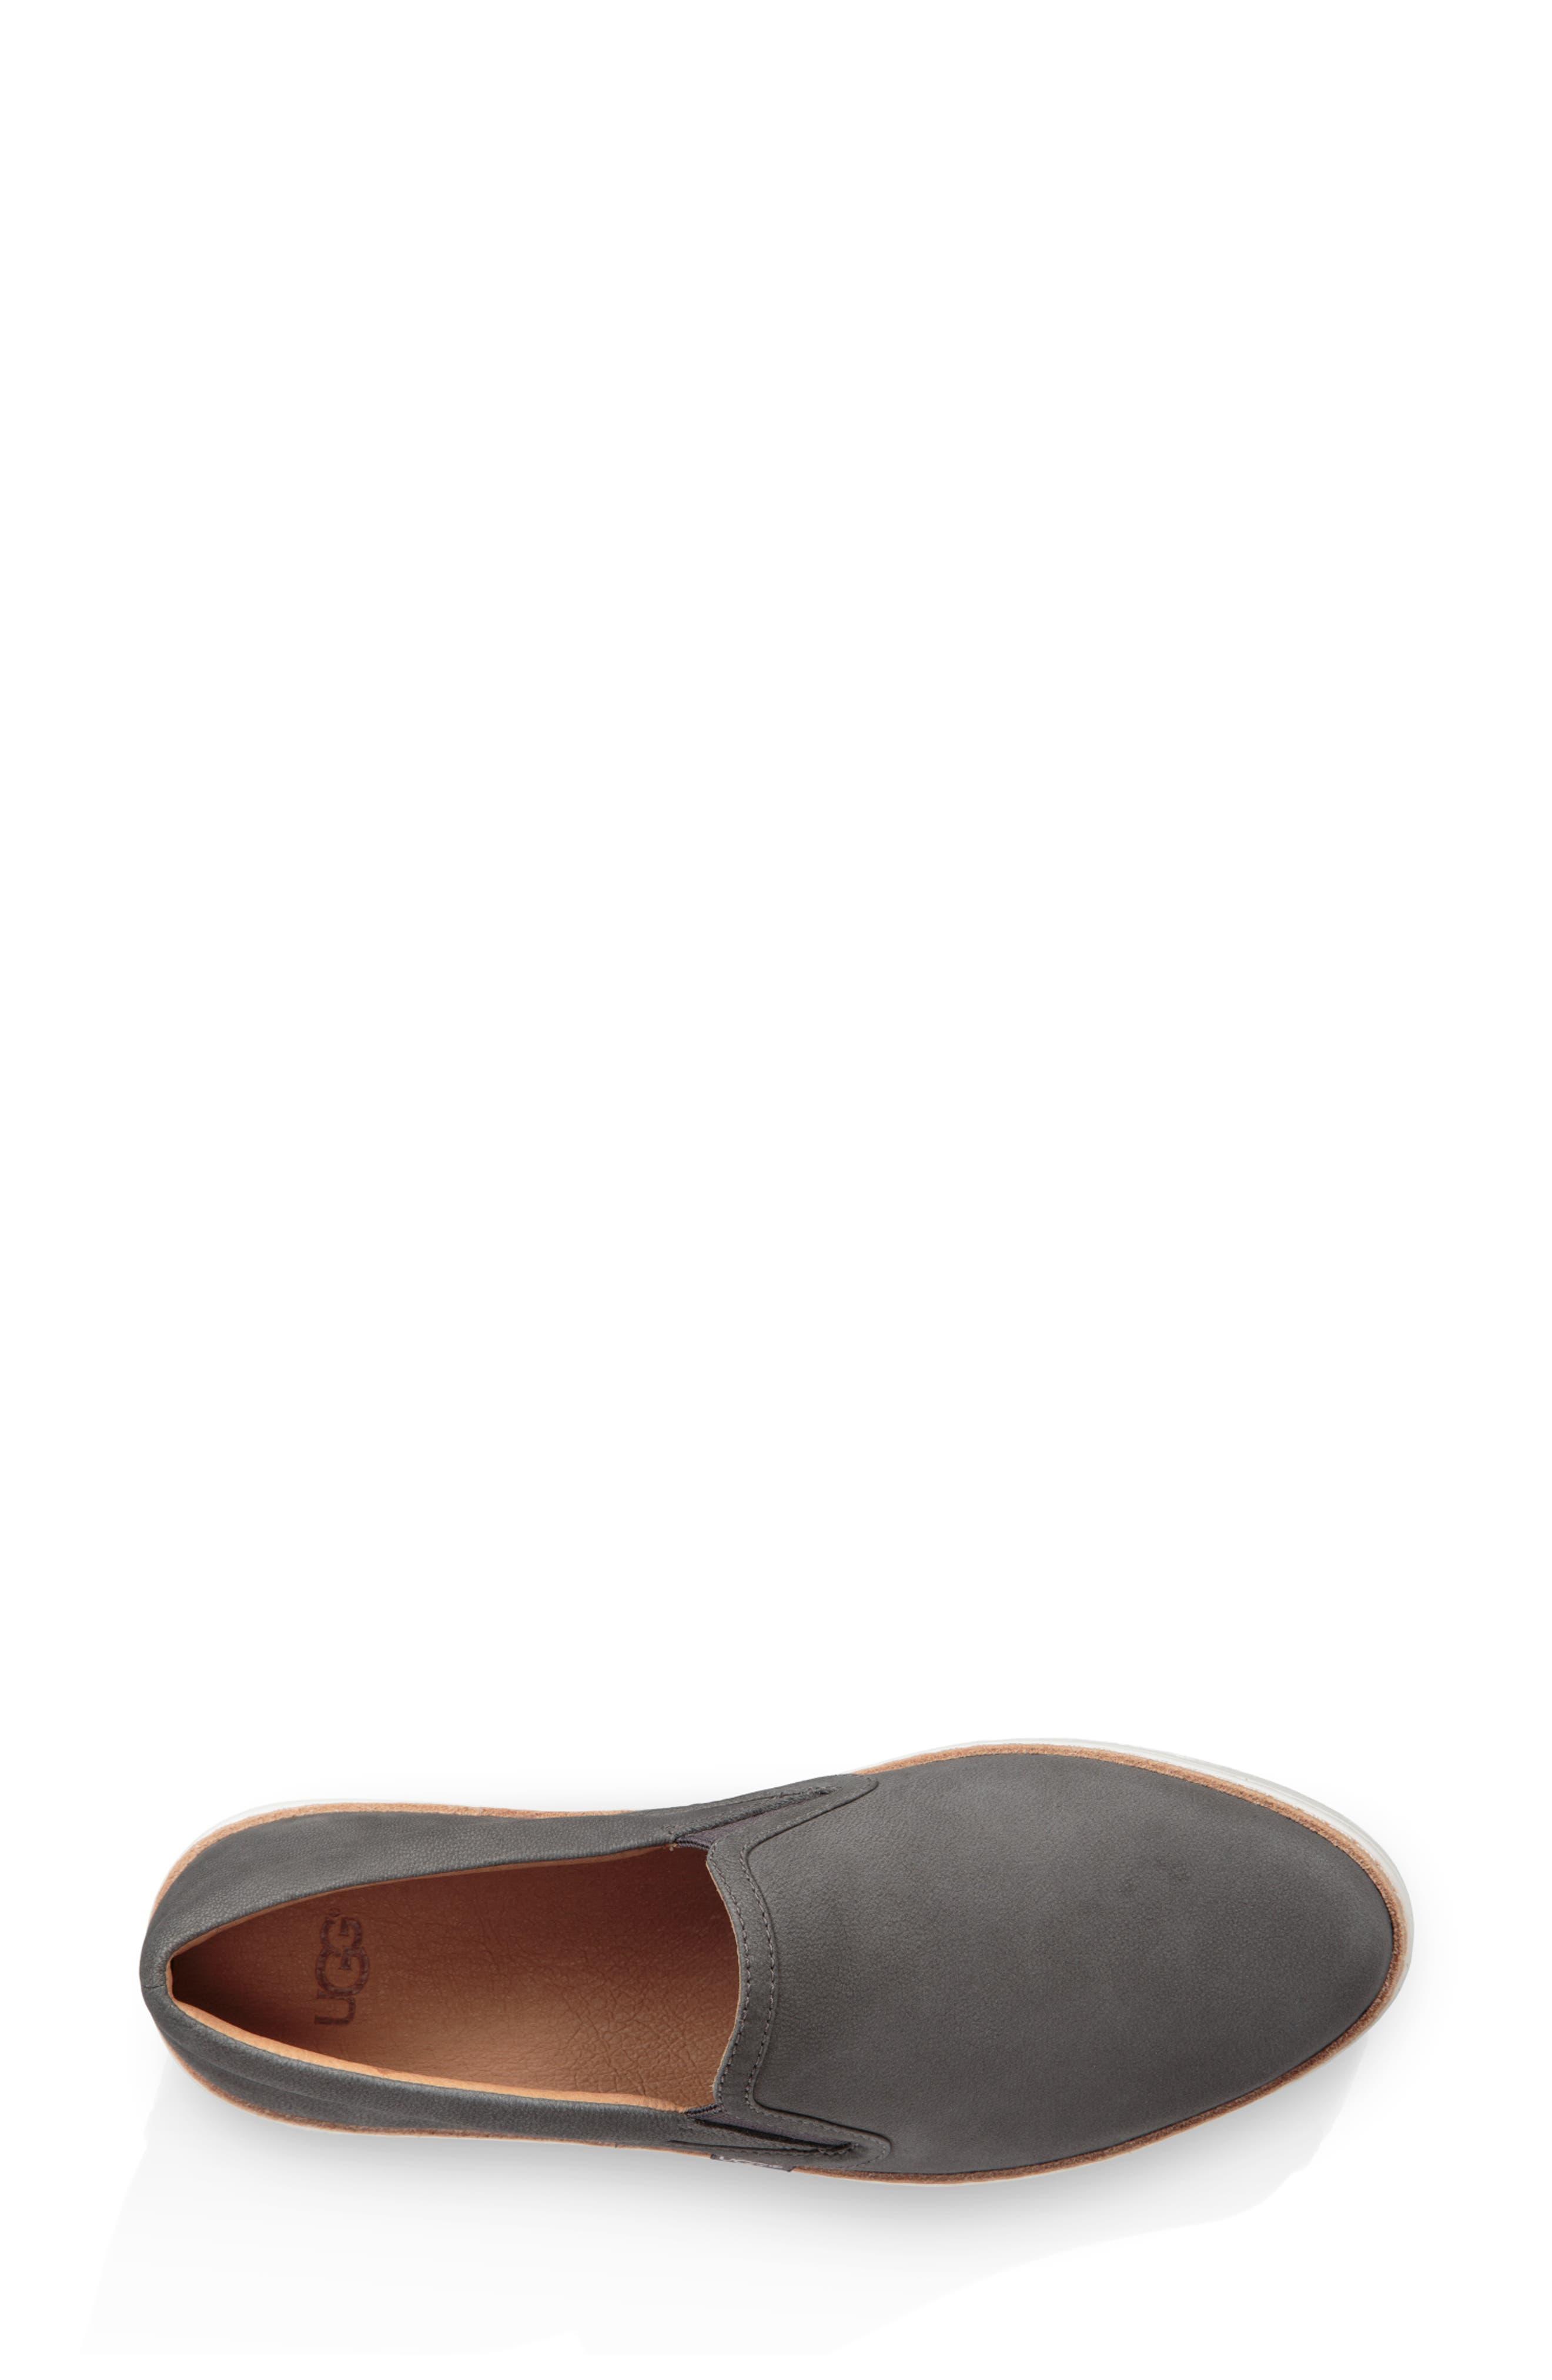 Soleda Slip-On Sneaker,                             Alternate thumbnail 4, color,                             CHARCOAL LEATHER